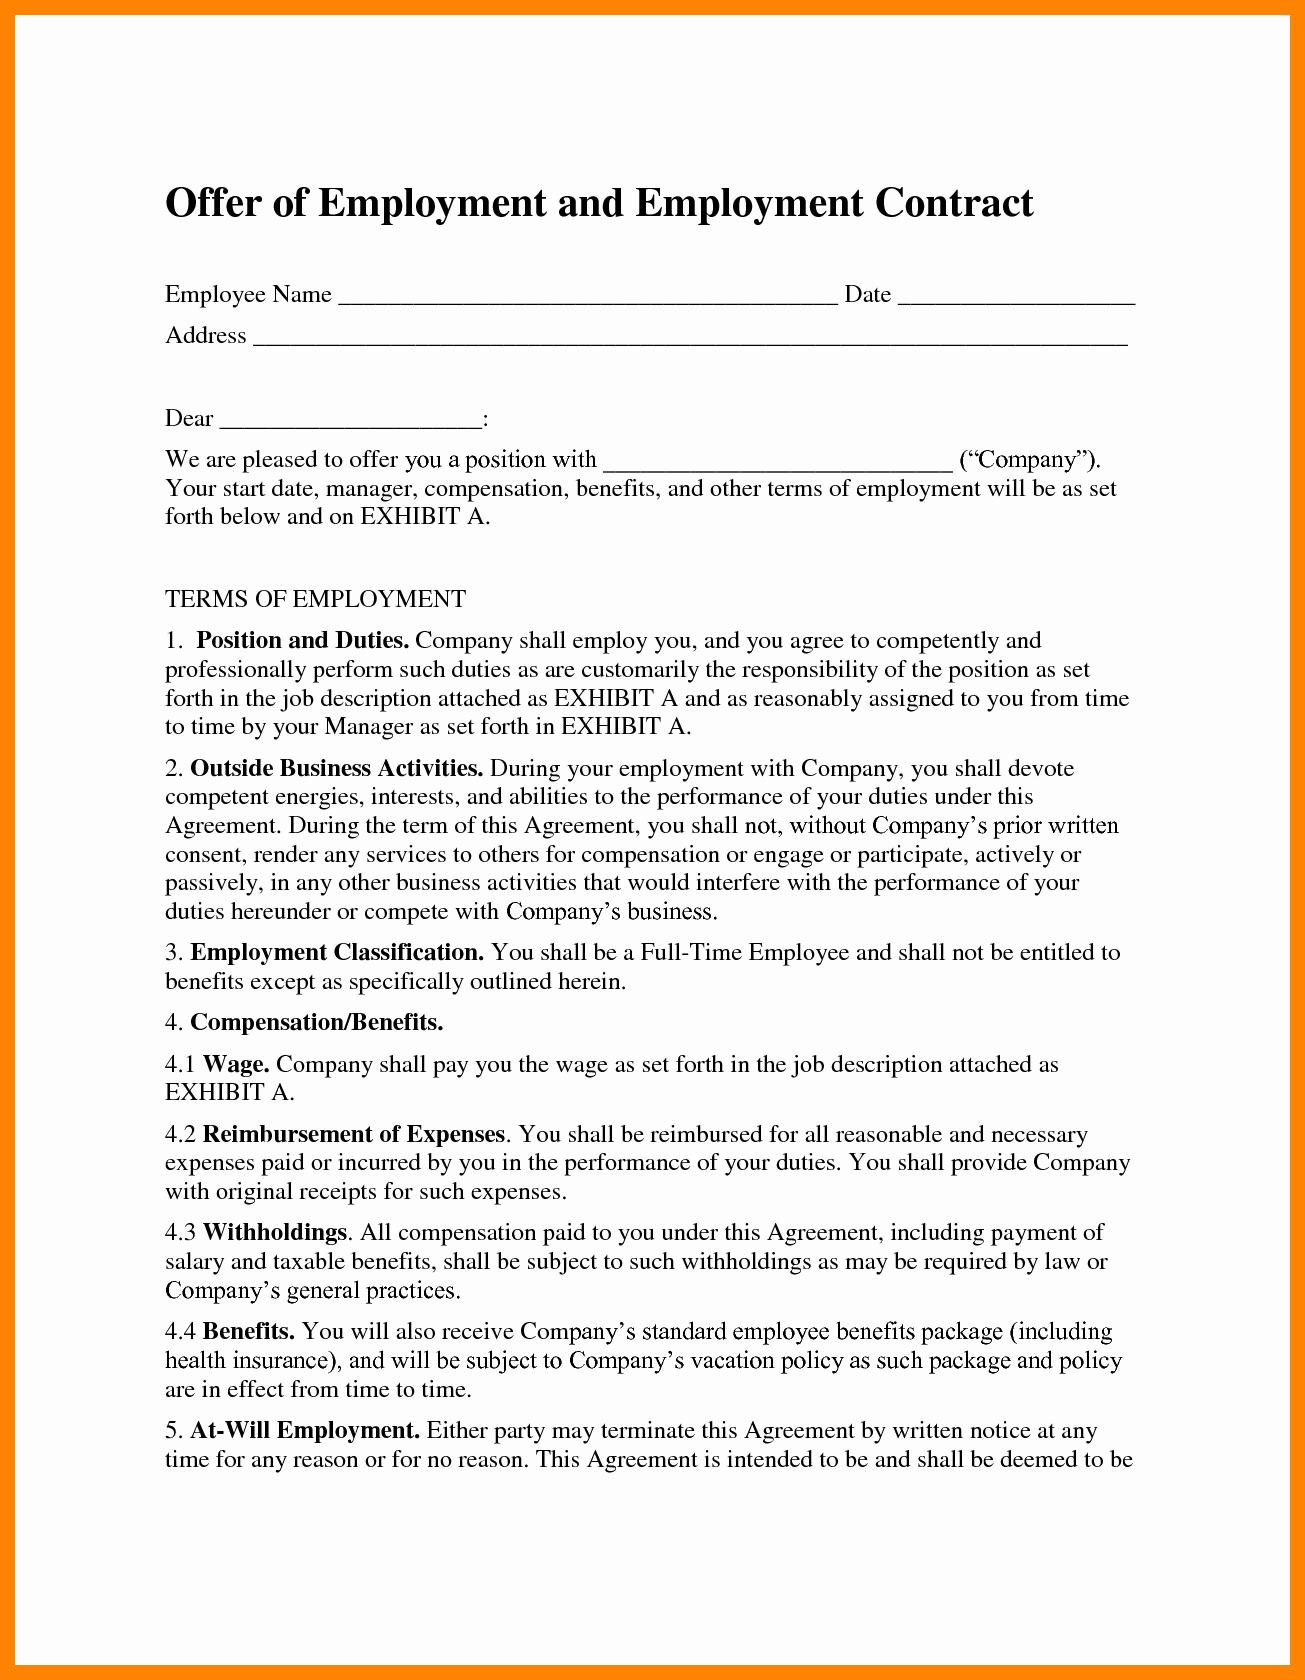 Employment Agreement Template Word Inspirational Employment Contract Template Word Portablegasgrillweber